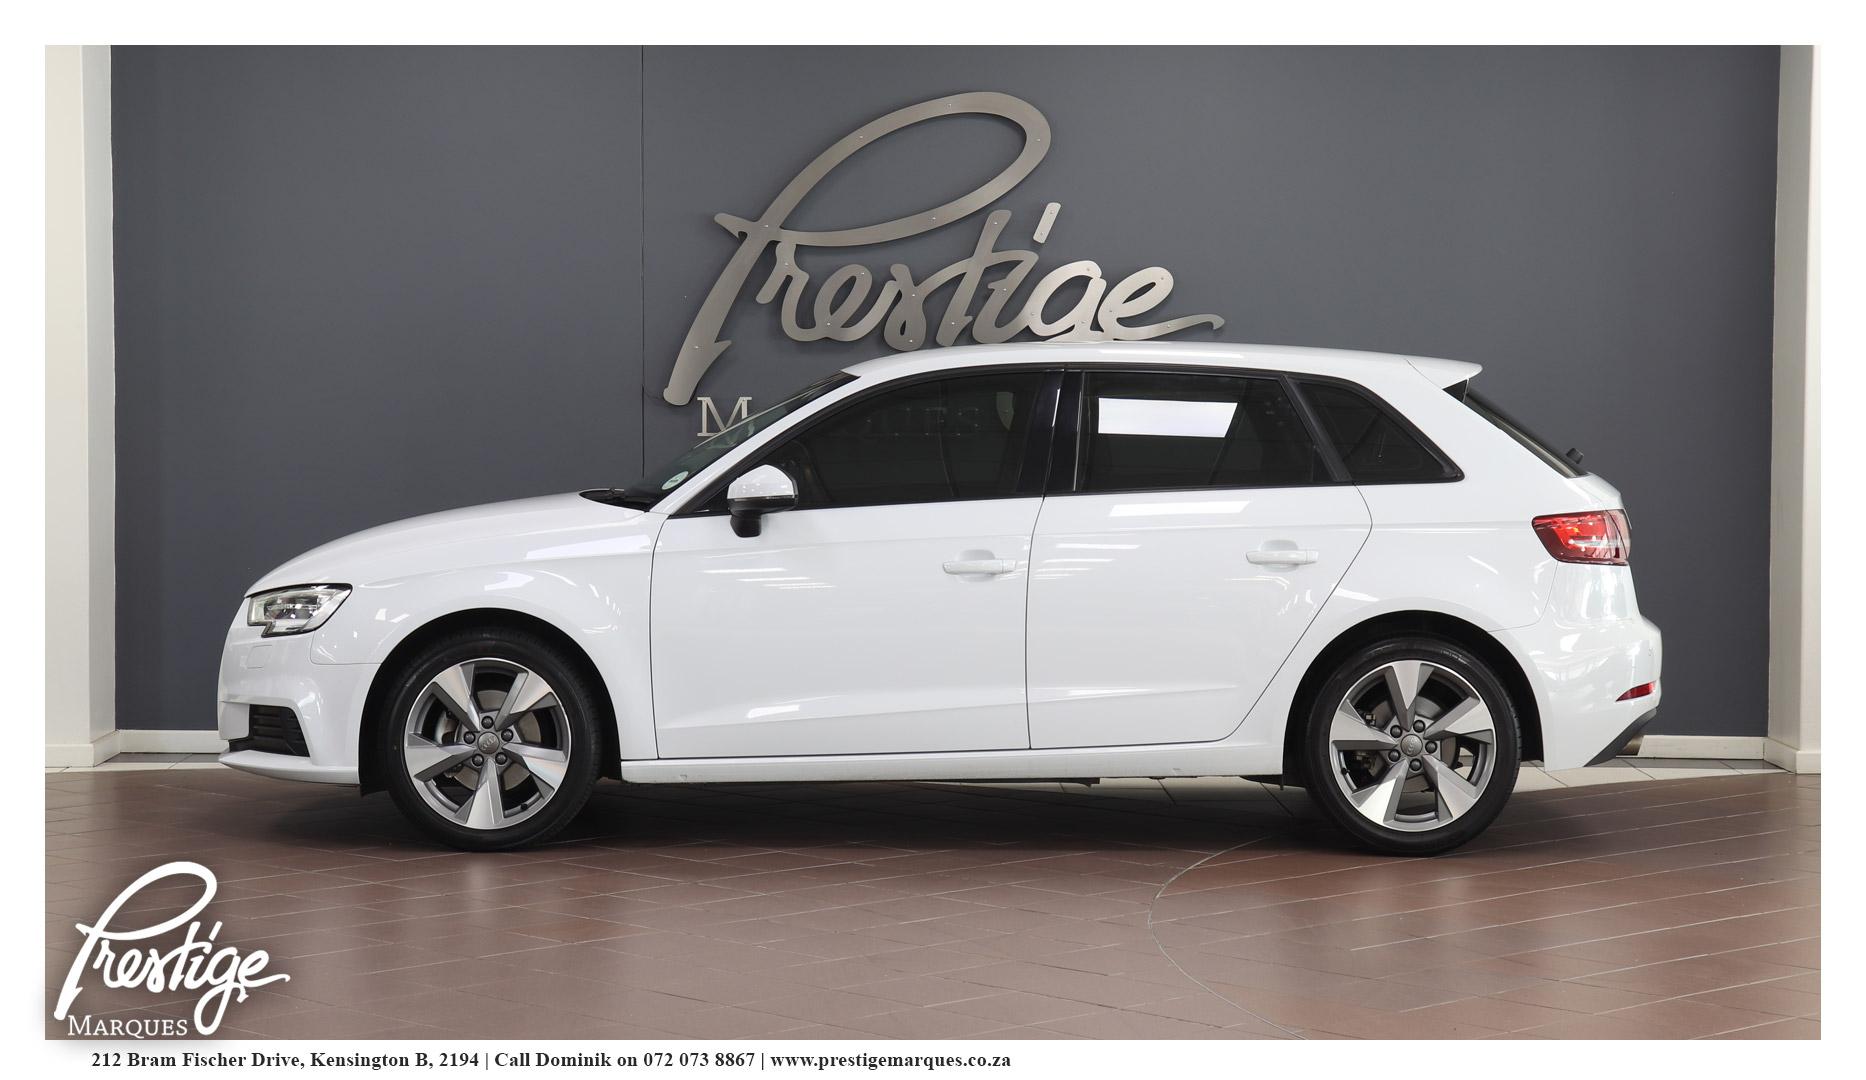 2017-Audi-A3-Sportback-1-4-TFSi-Stronic-Prestige-Marques-Randburg-Sandton-7